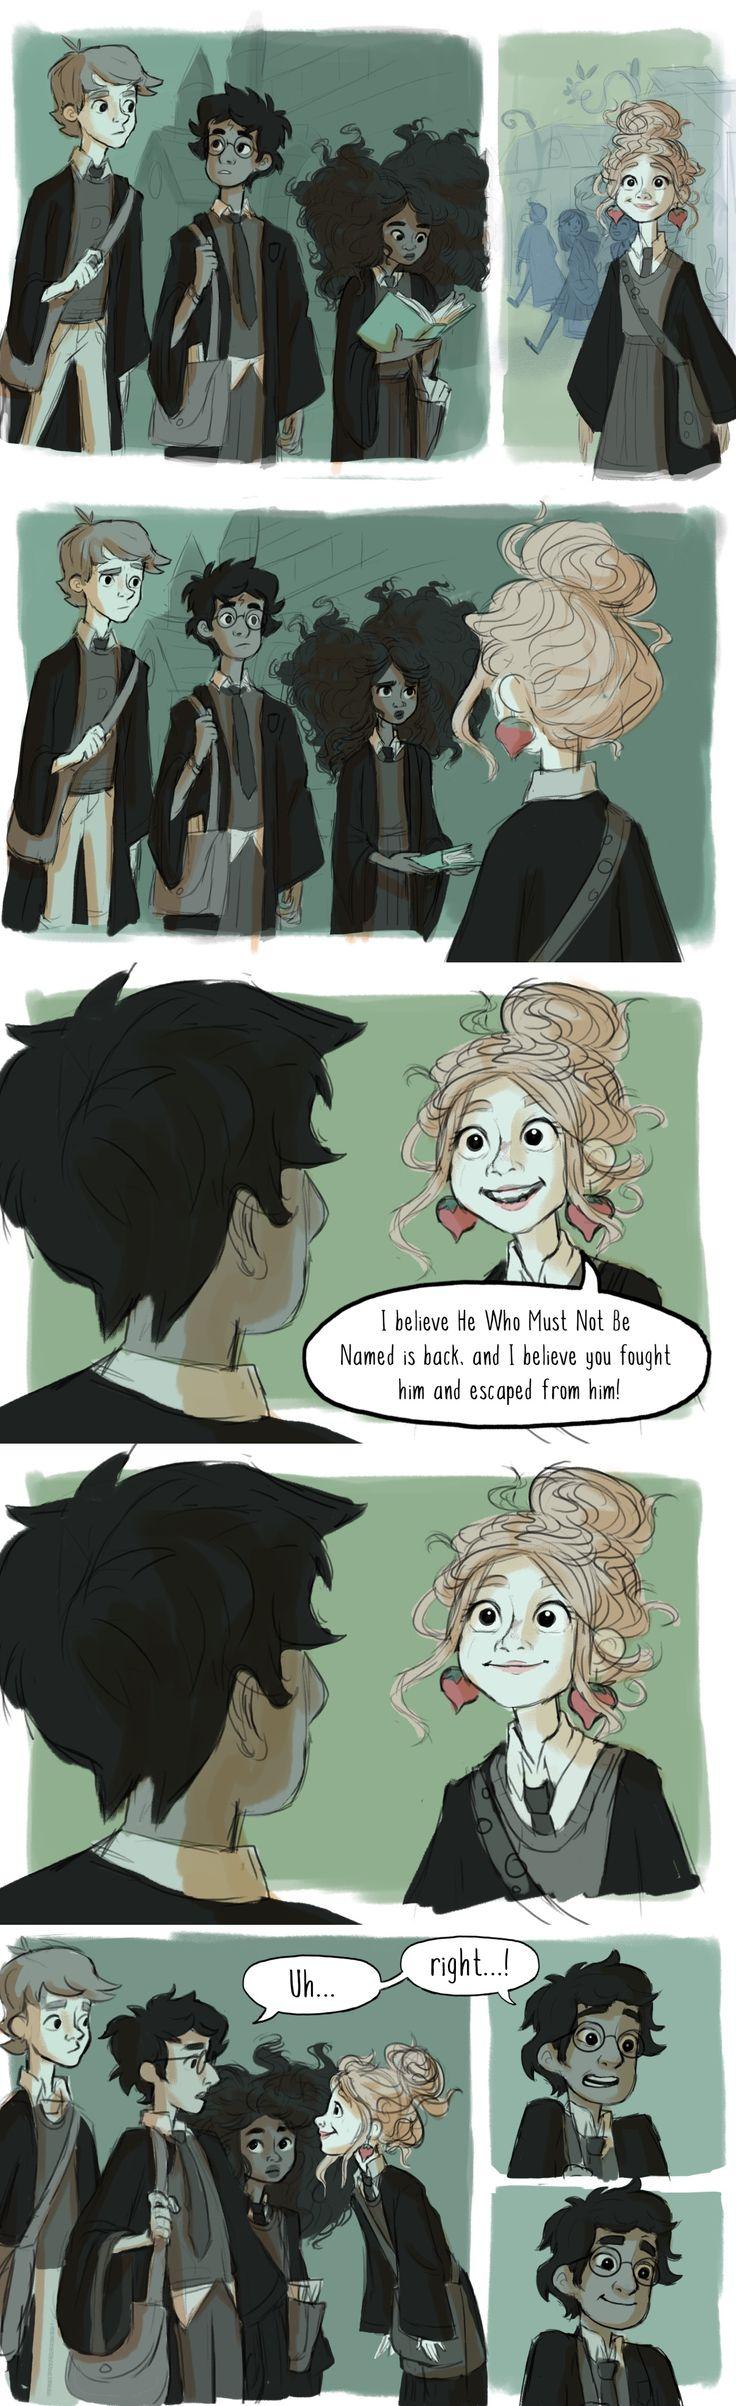 One of my favorite Luna scenes in Order of the Phoenix! Blatant Luna is life.